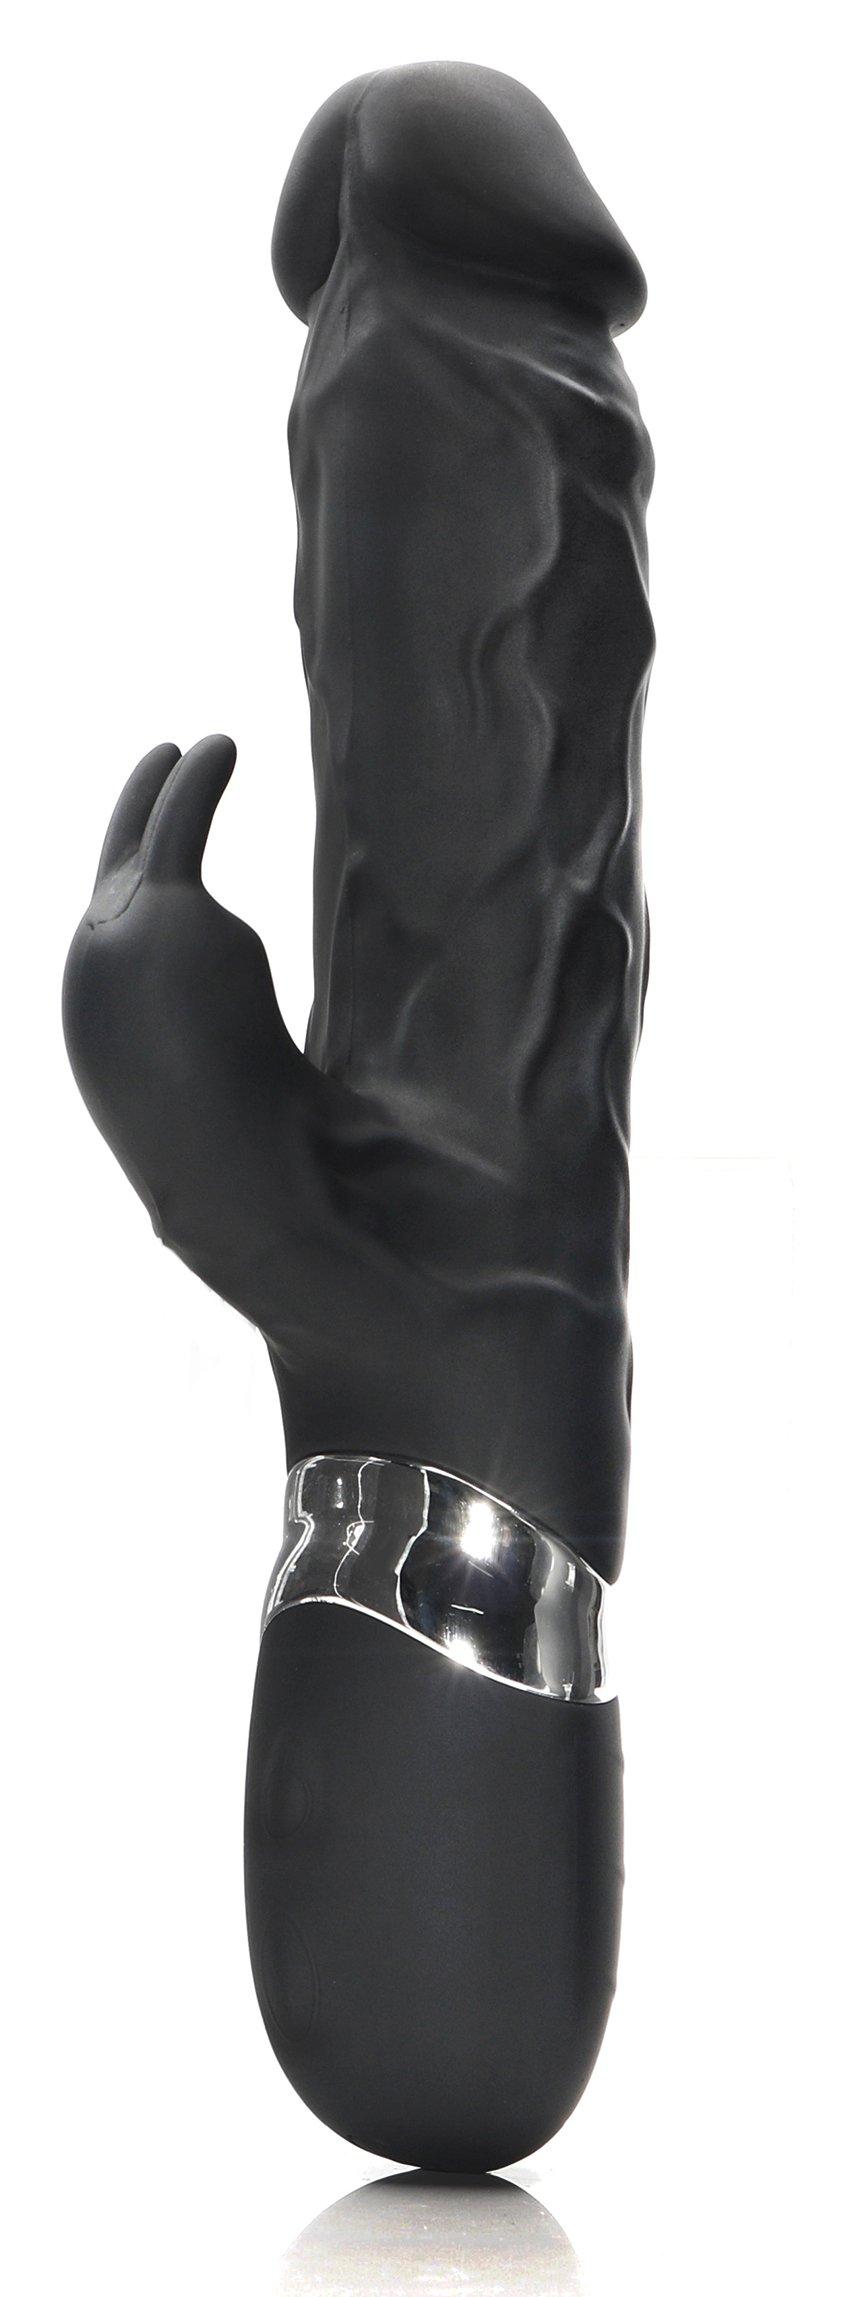 Badboy Black Vibrator Silicone Realistic Dildo Vibratory Massage Rechargeable Rabbit Vibrateur for Women Clitorial Stimulation Adult Toys